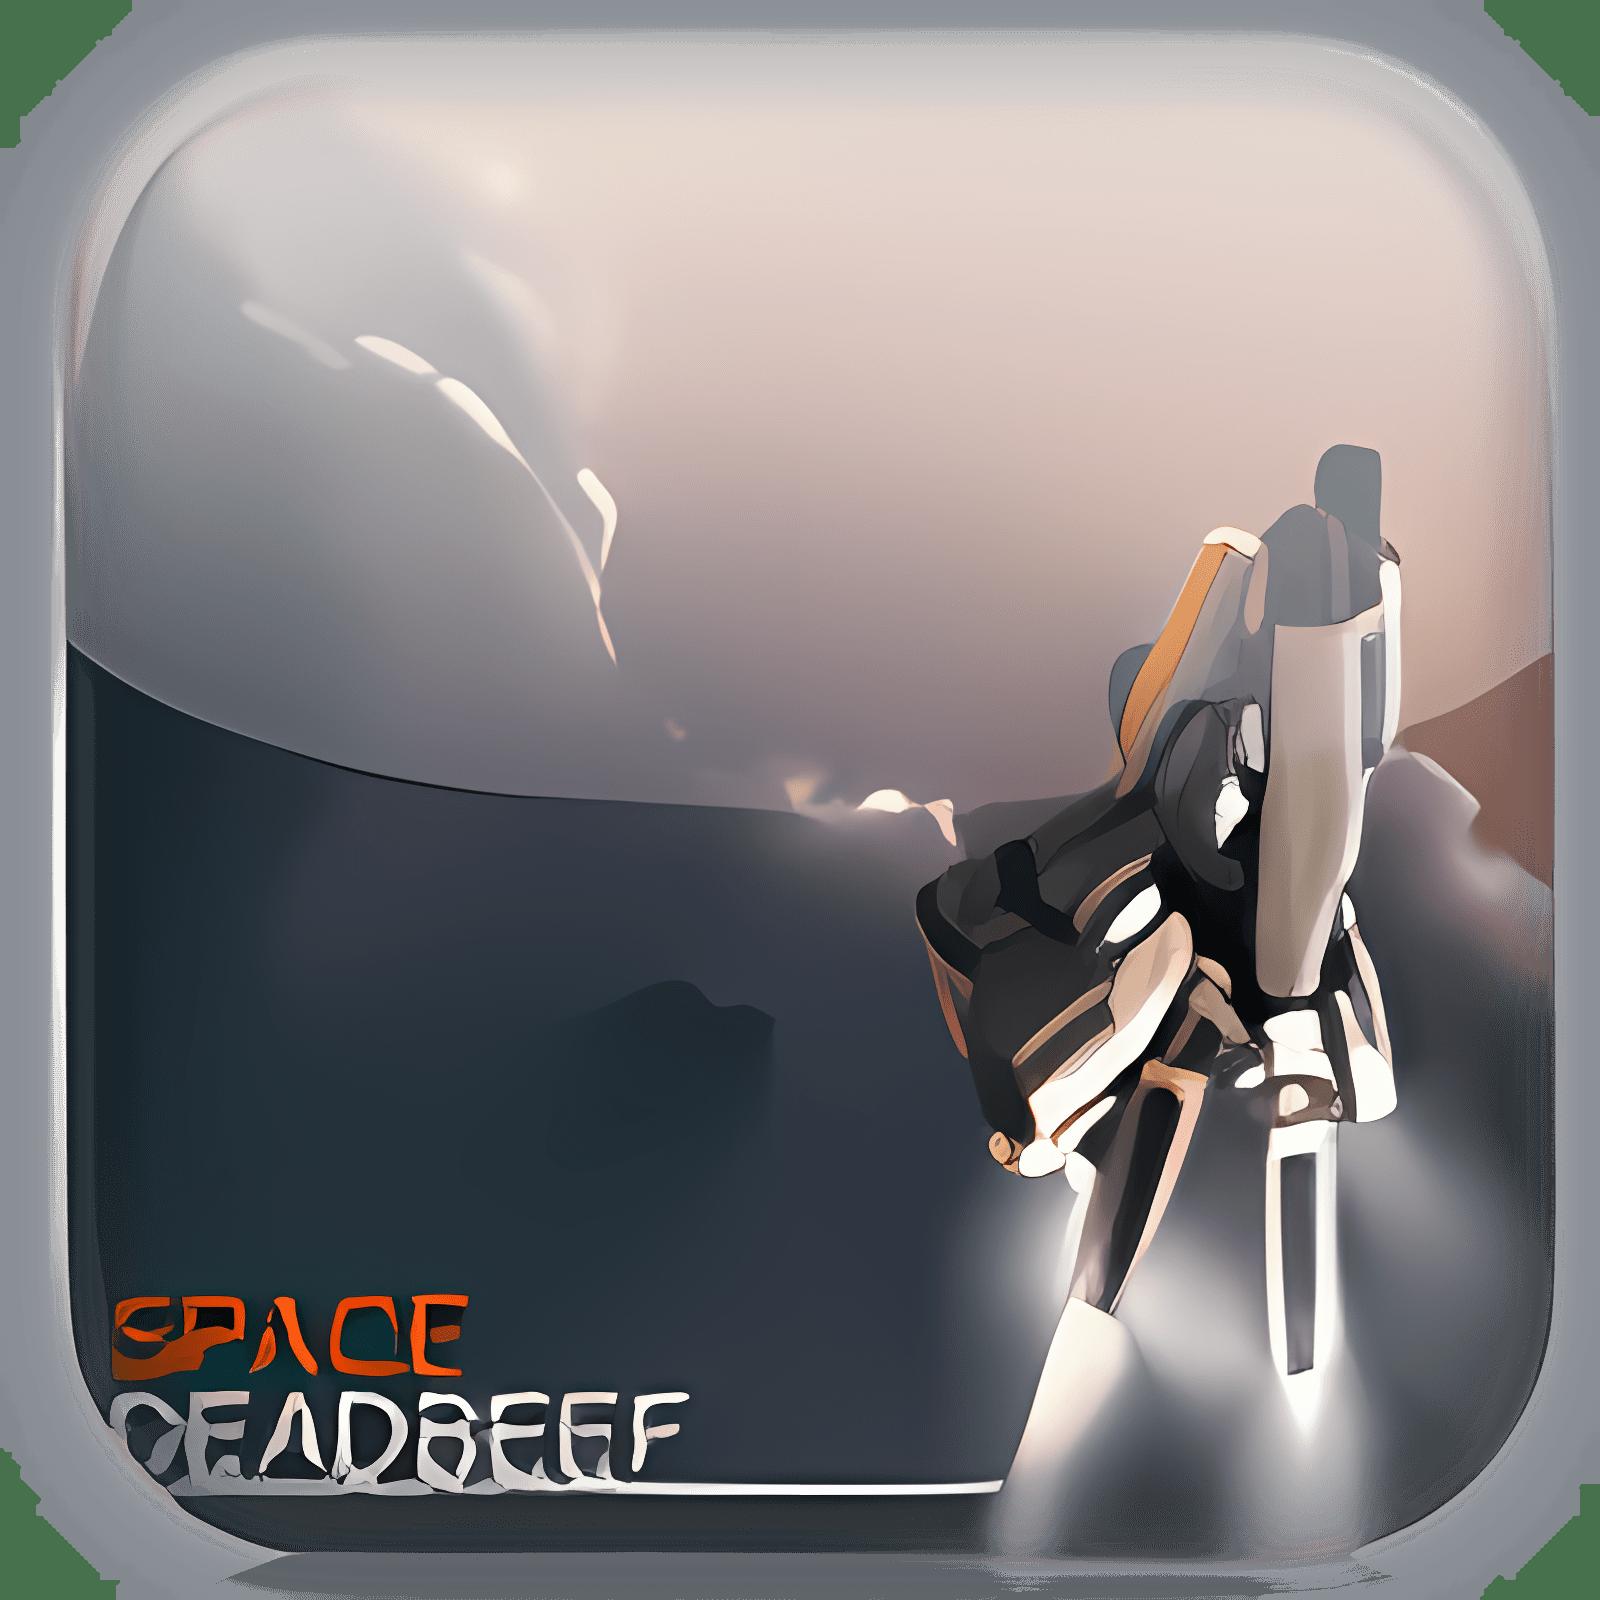 Space Deadbeef